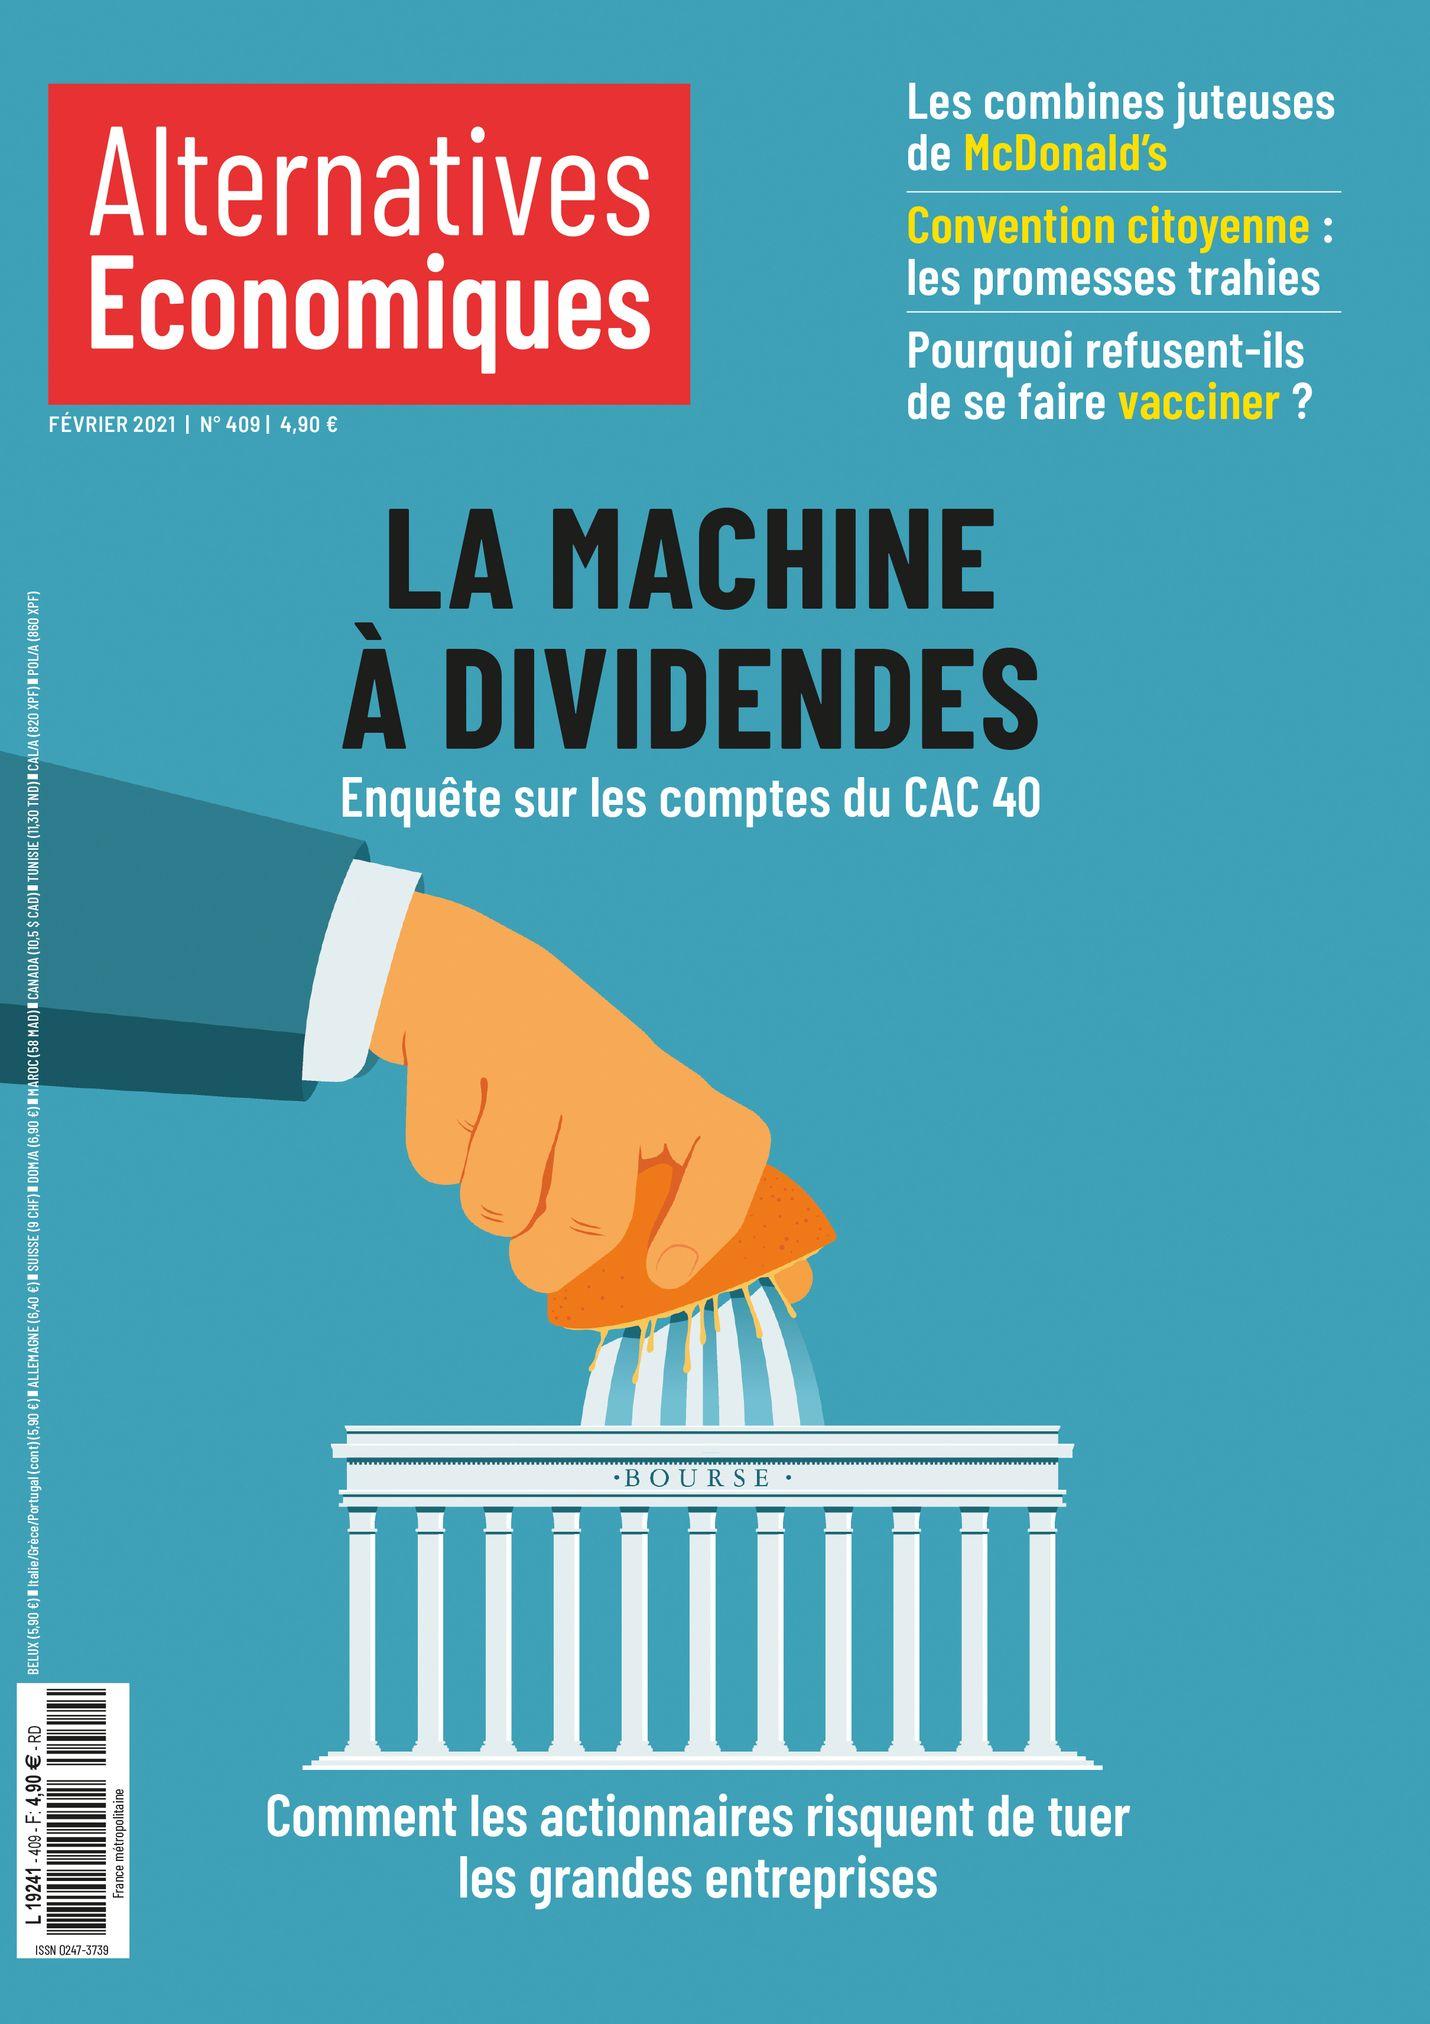 garance-illustration-Alternatives-economiques-Cac-40-the-dividend-machine_web